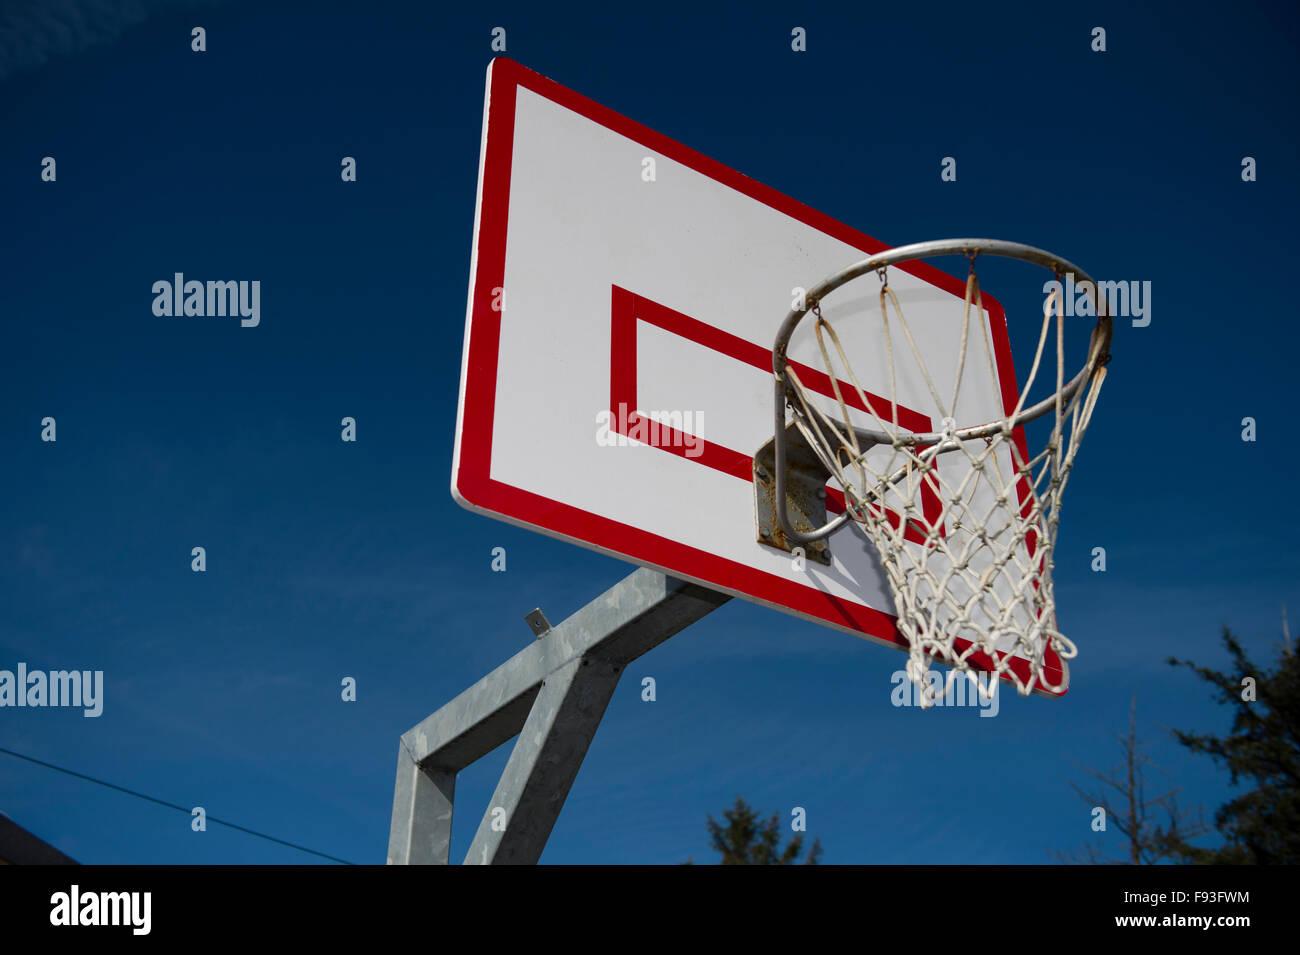 Secondary education Wales UK: a net ball net - Stock Image